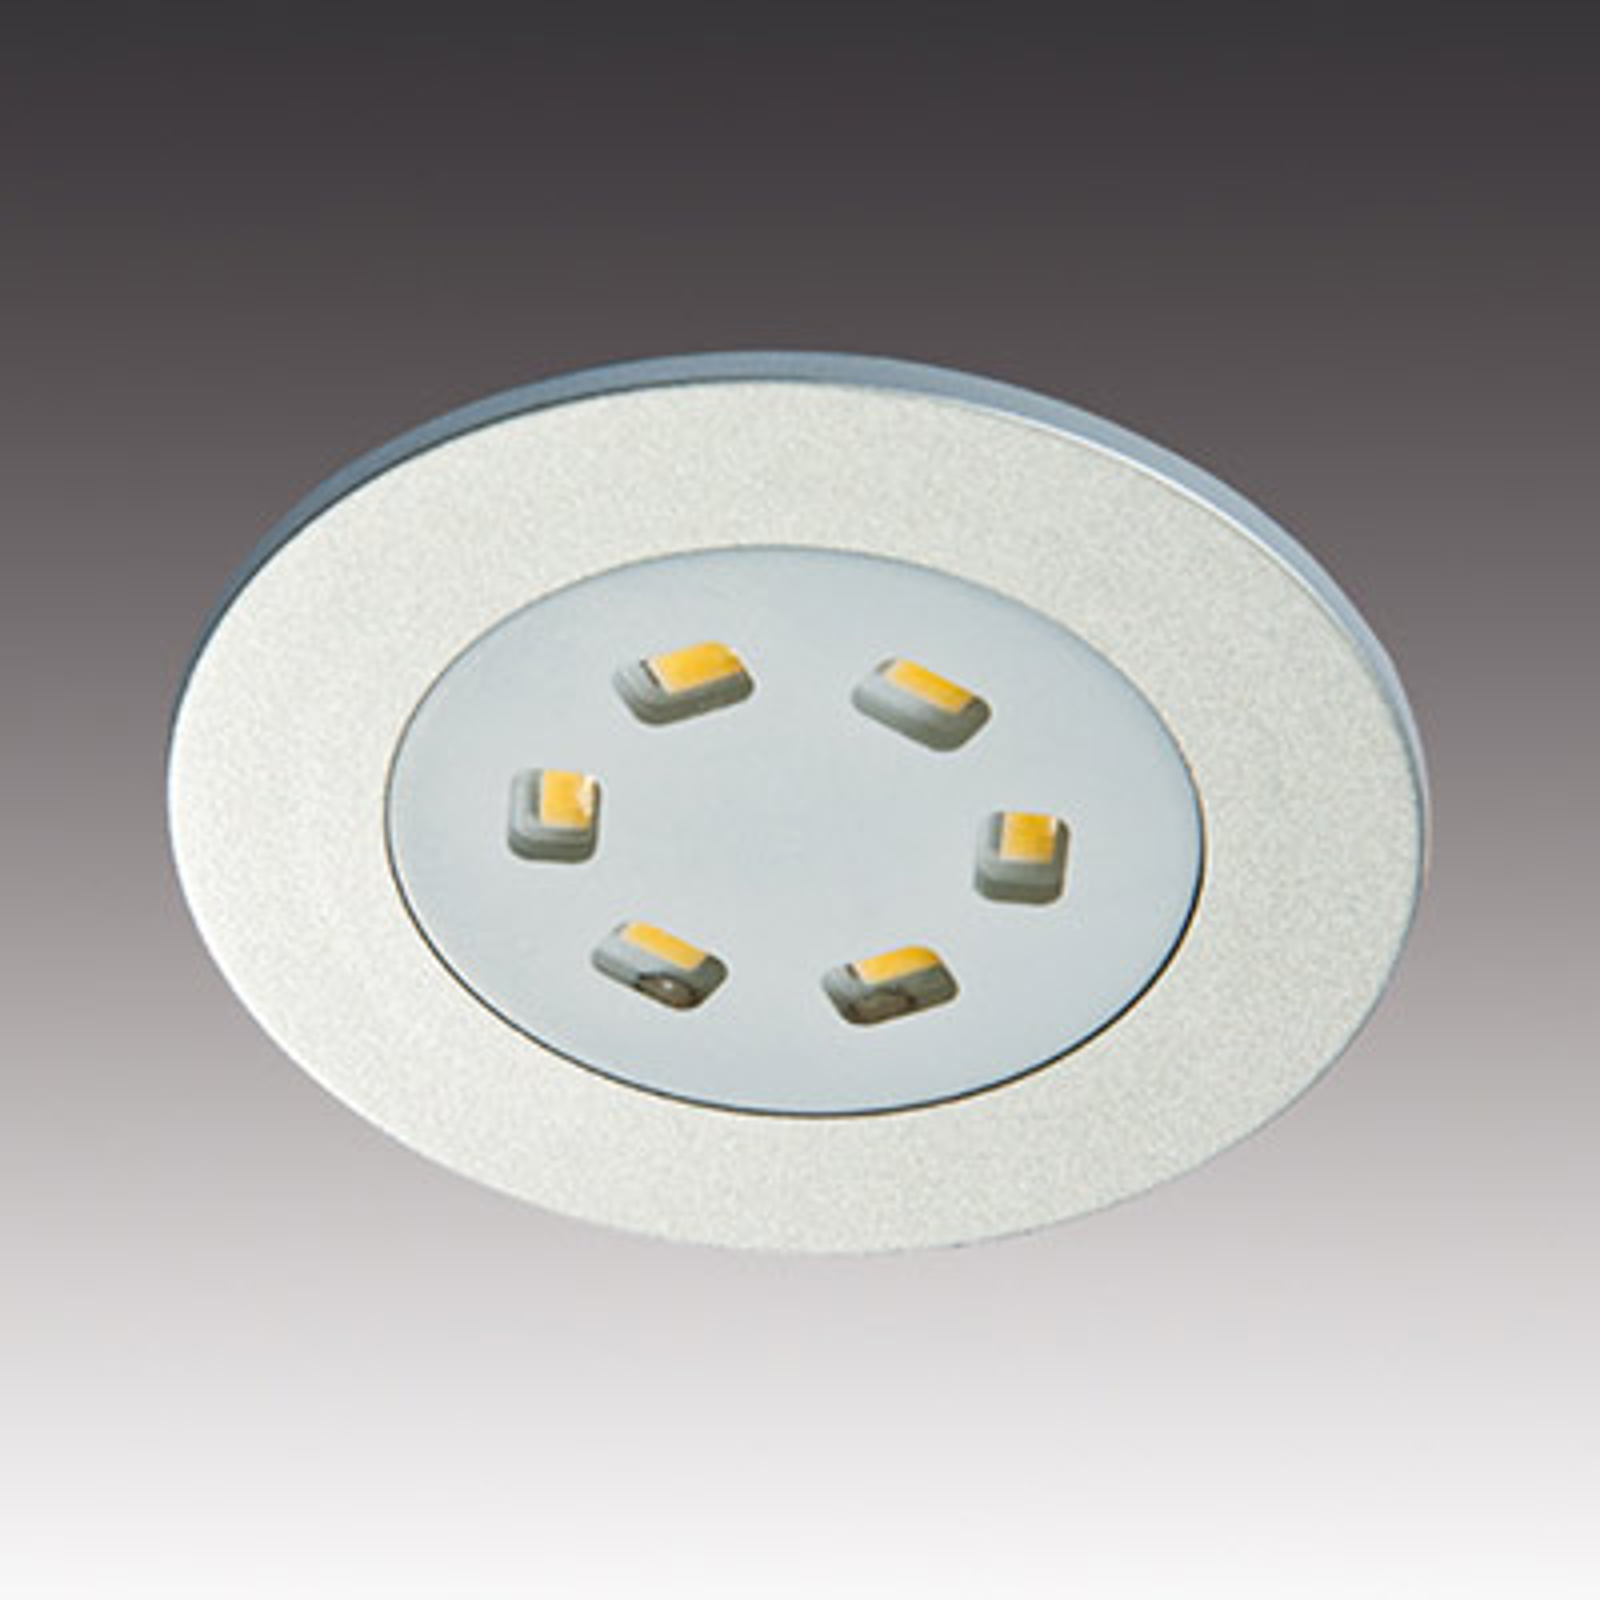 Den flade integrerede lampe R 55